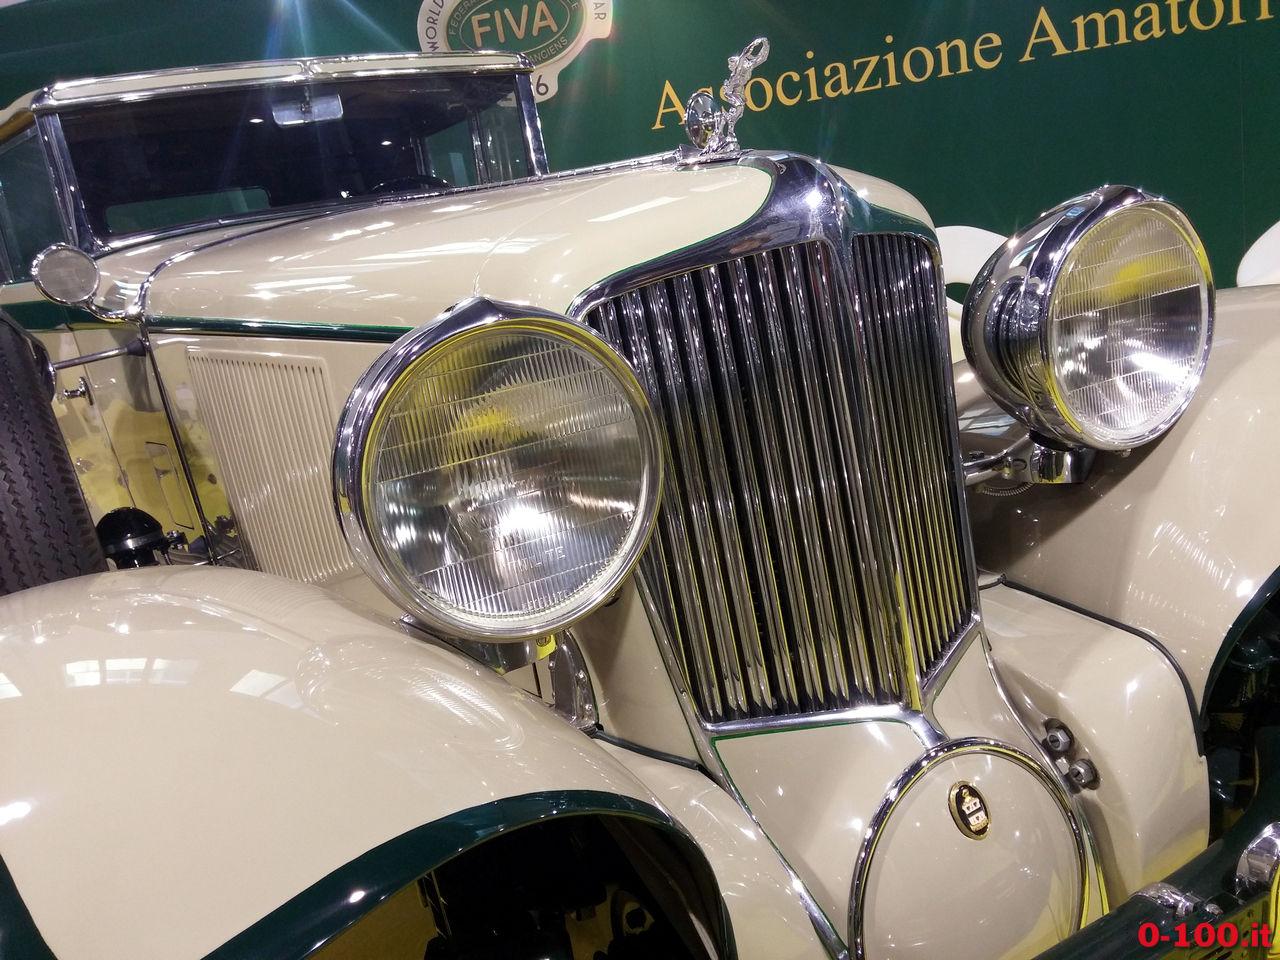 automotodepoca-2016-car-market-mercato-auto-prezzo-price_0-10056